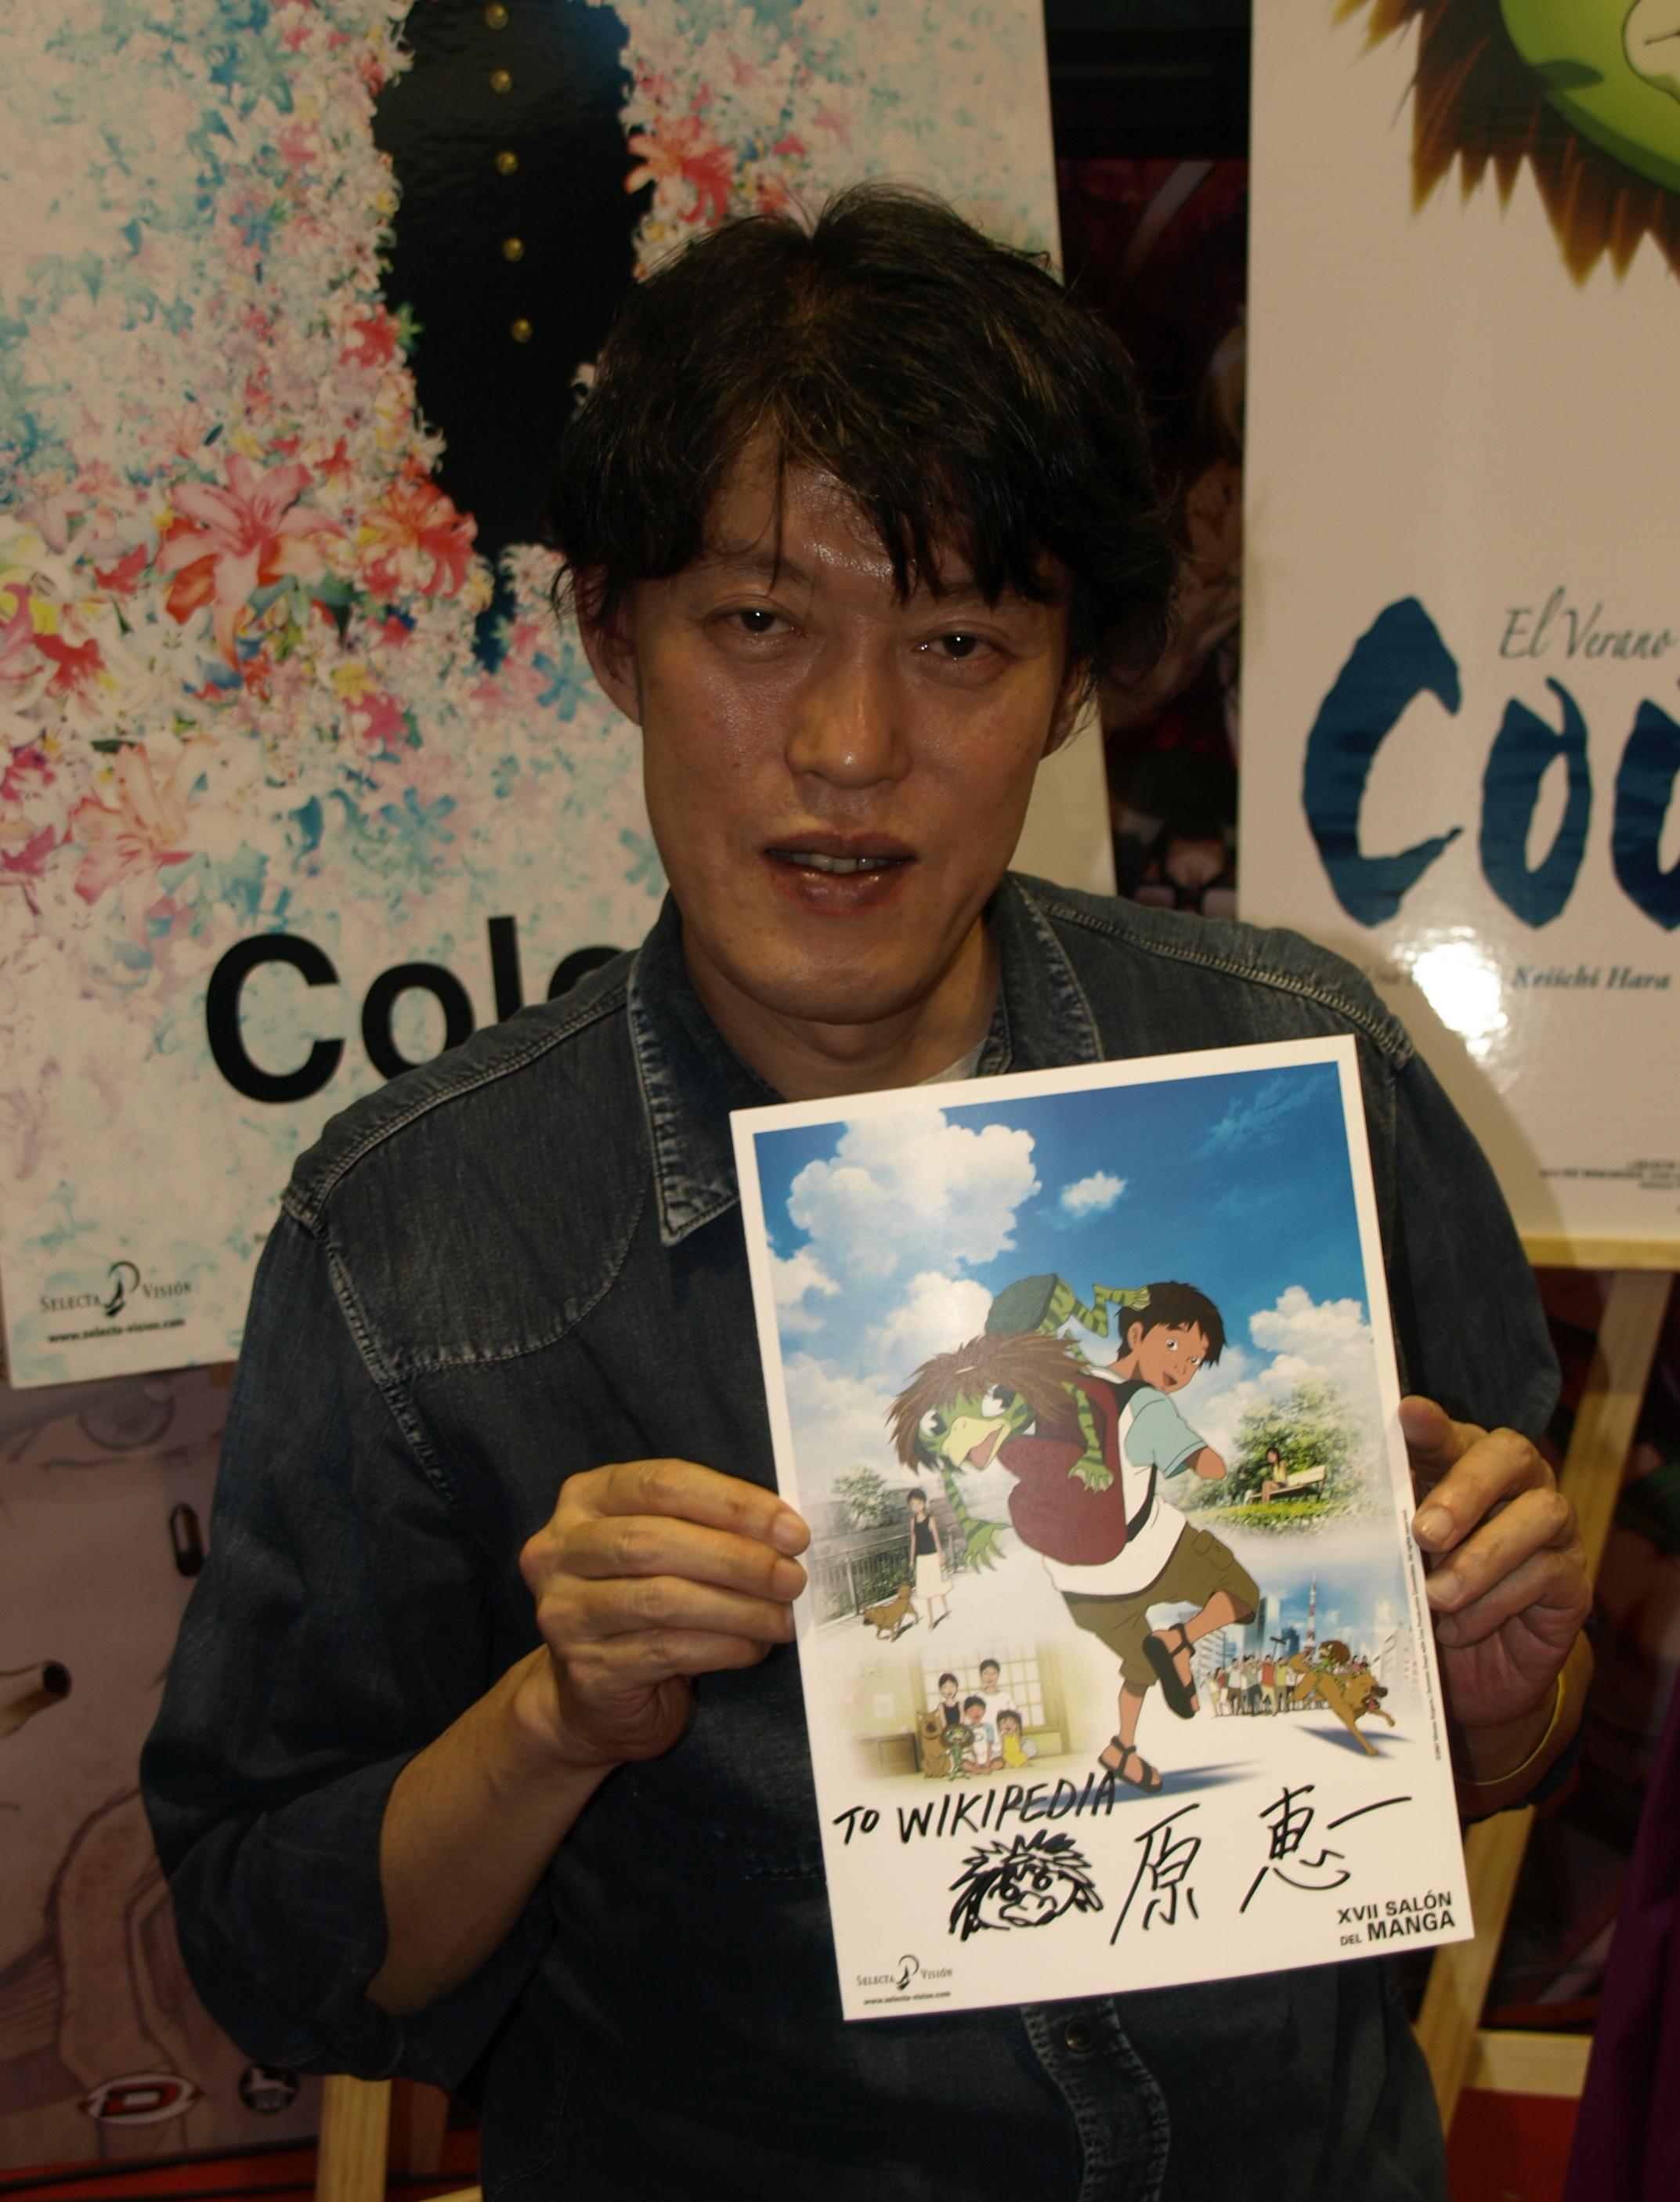 Depiction of Keiichi Hara